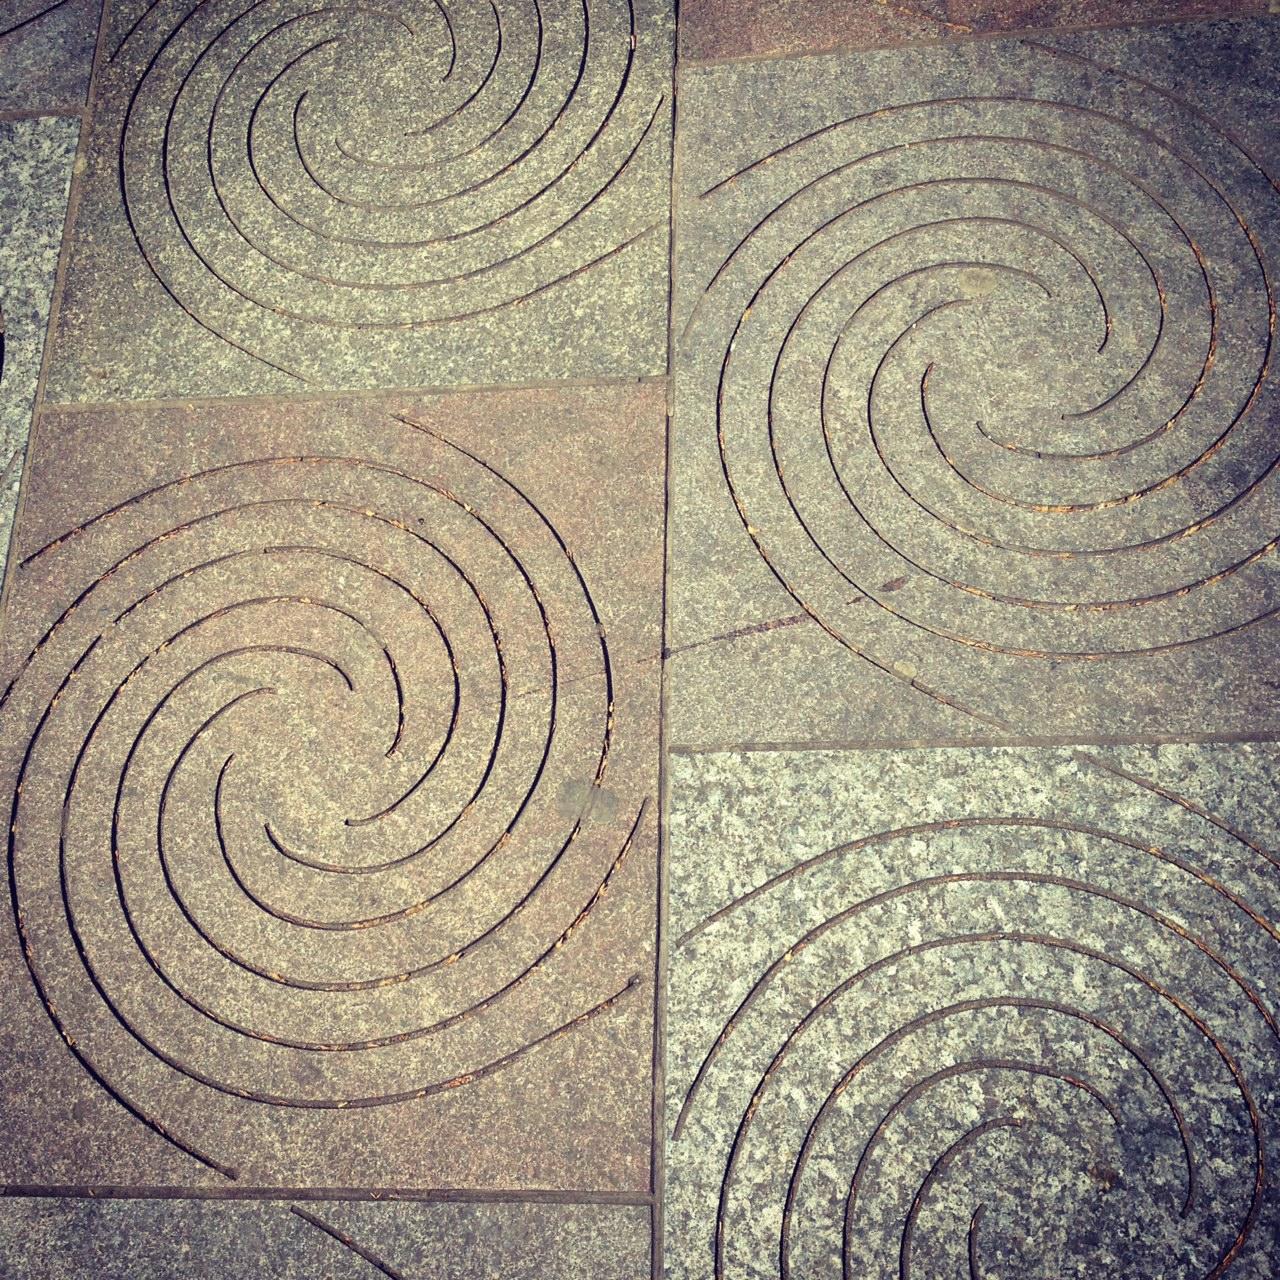 Swirl pattern in pavement